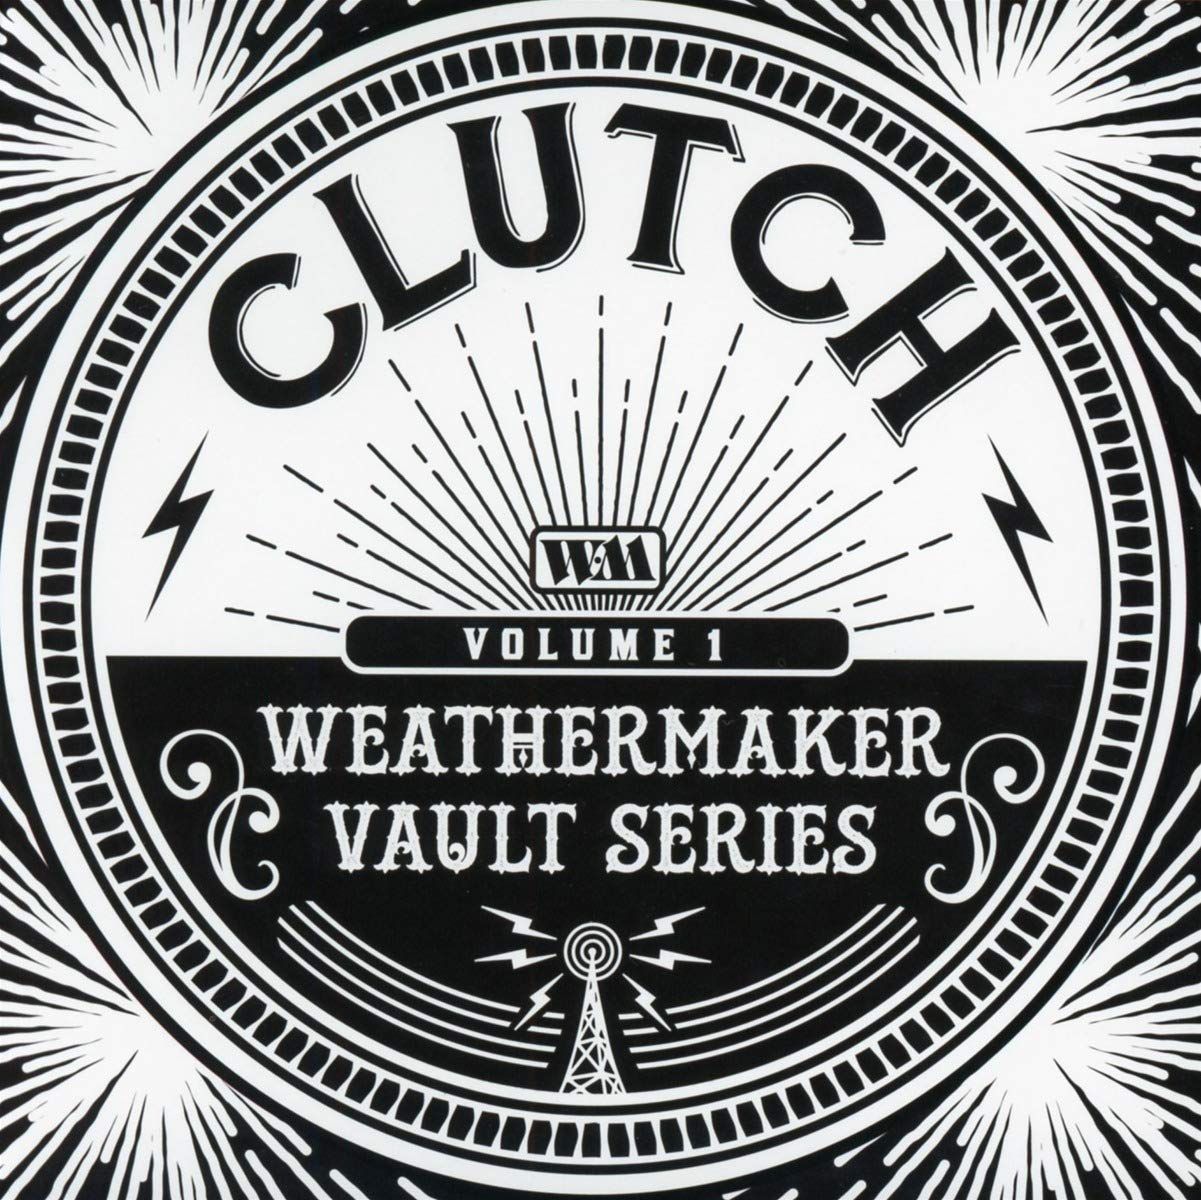 The Weathermaker Vault Series Vol.I